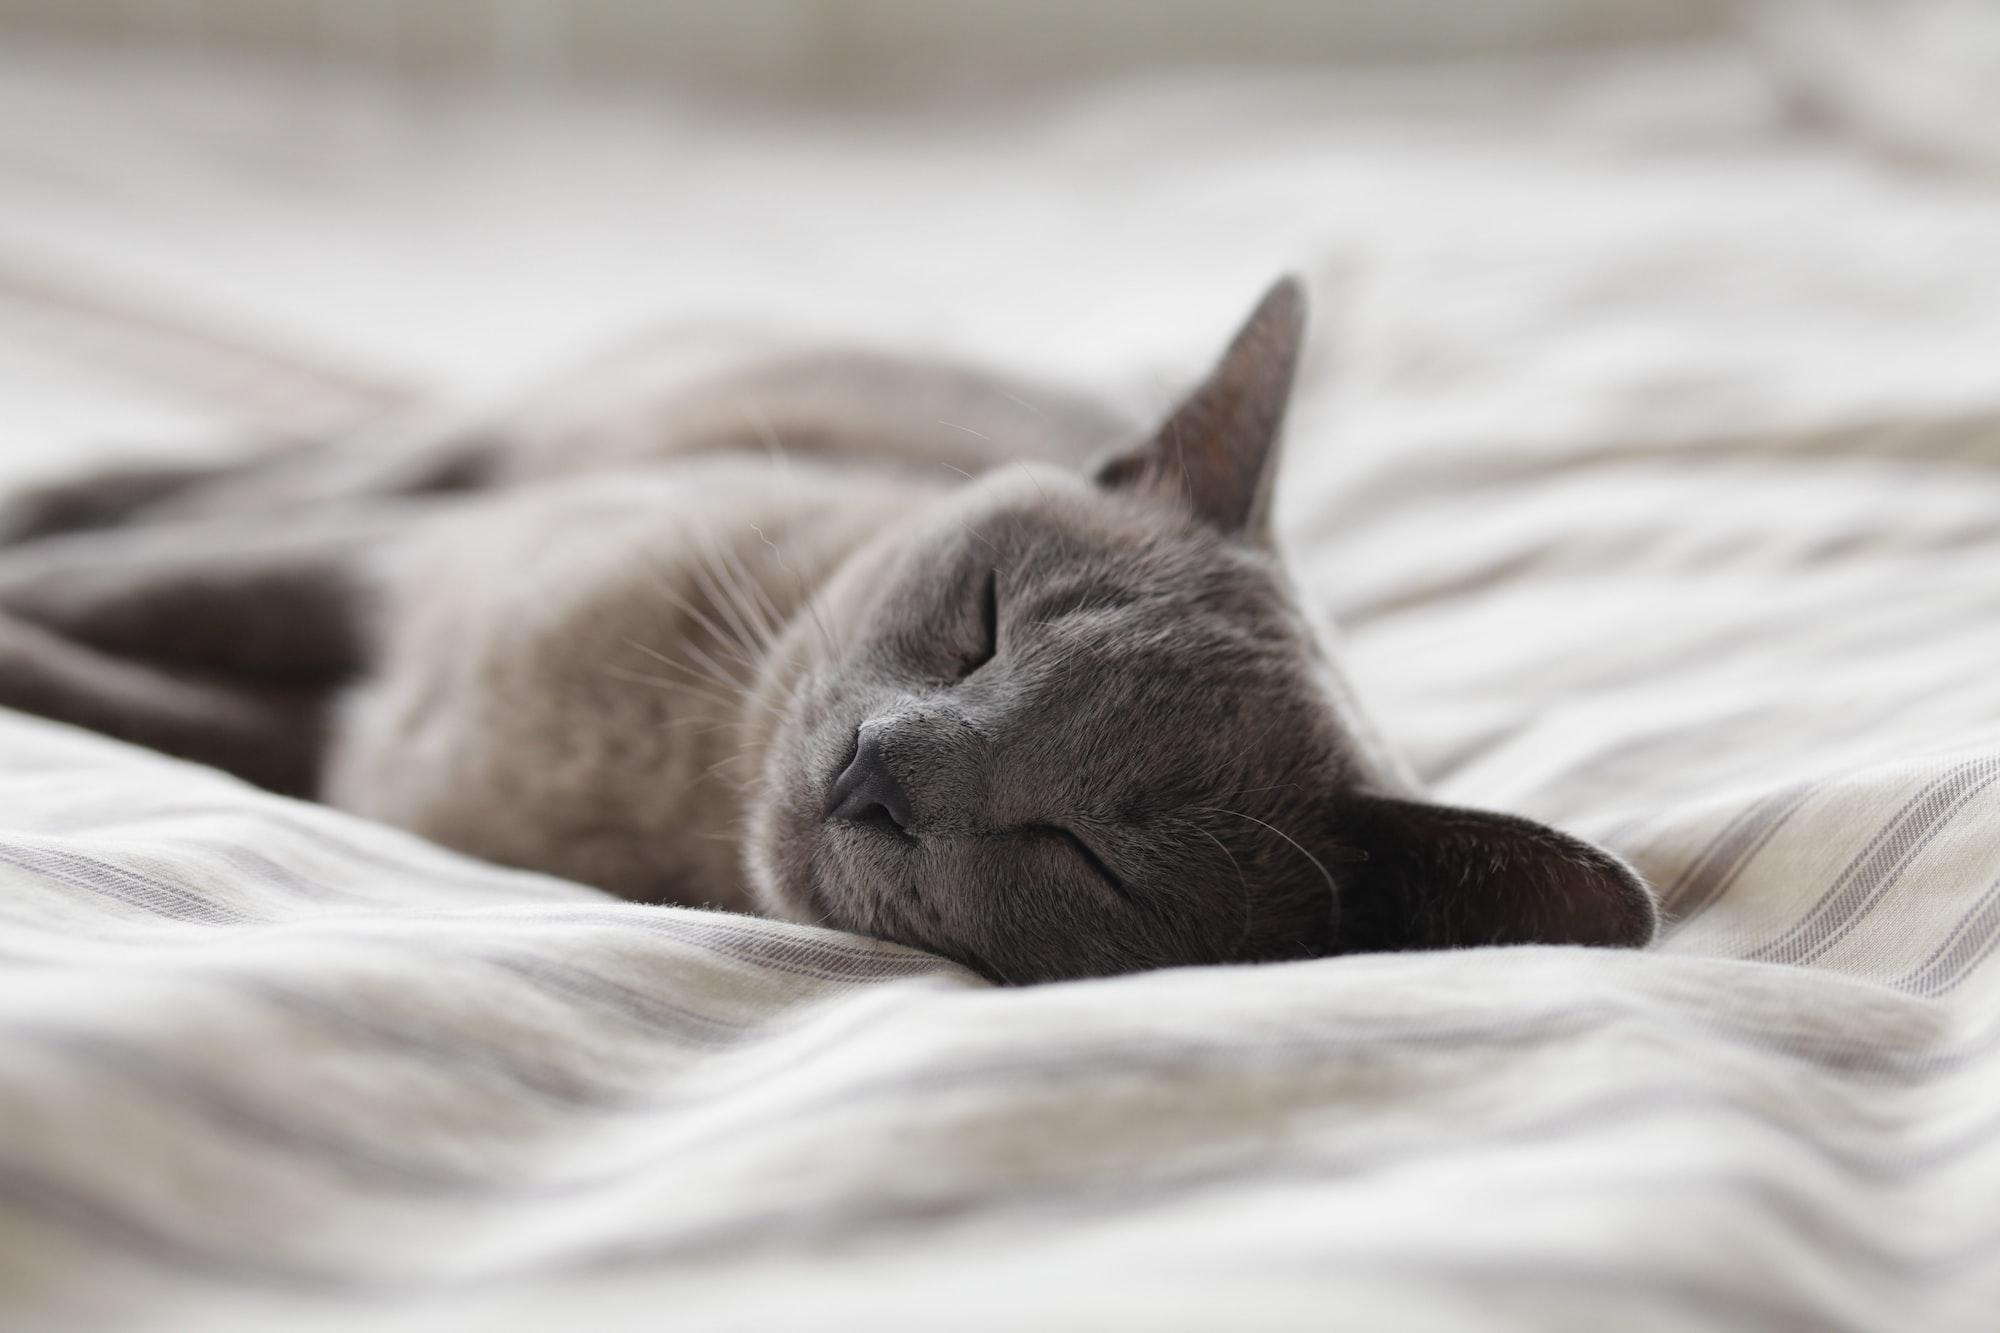 How to sleep on time